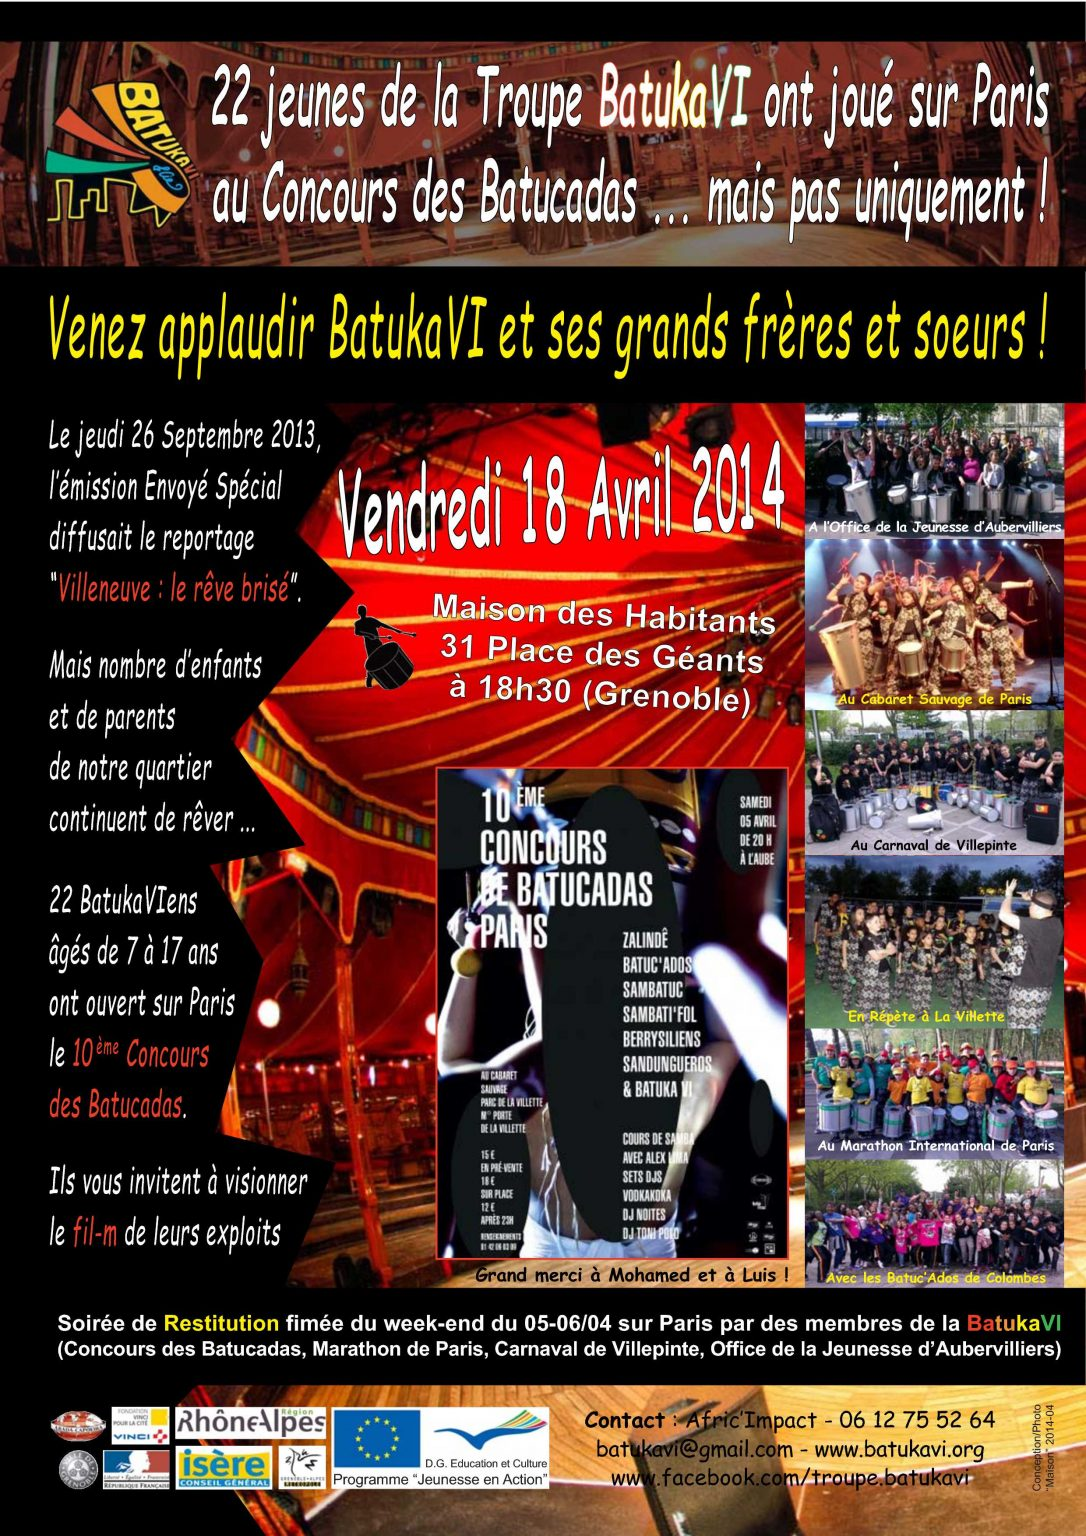 2014-04 Soirée Cabaret Sauvage (Restitution)